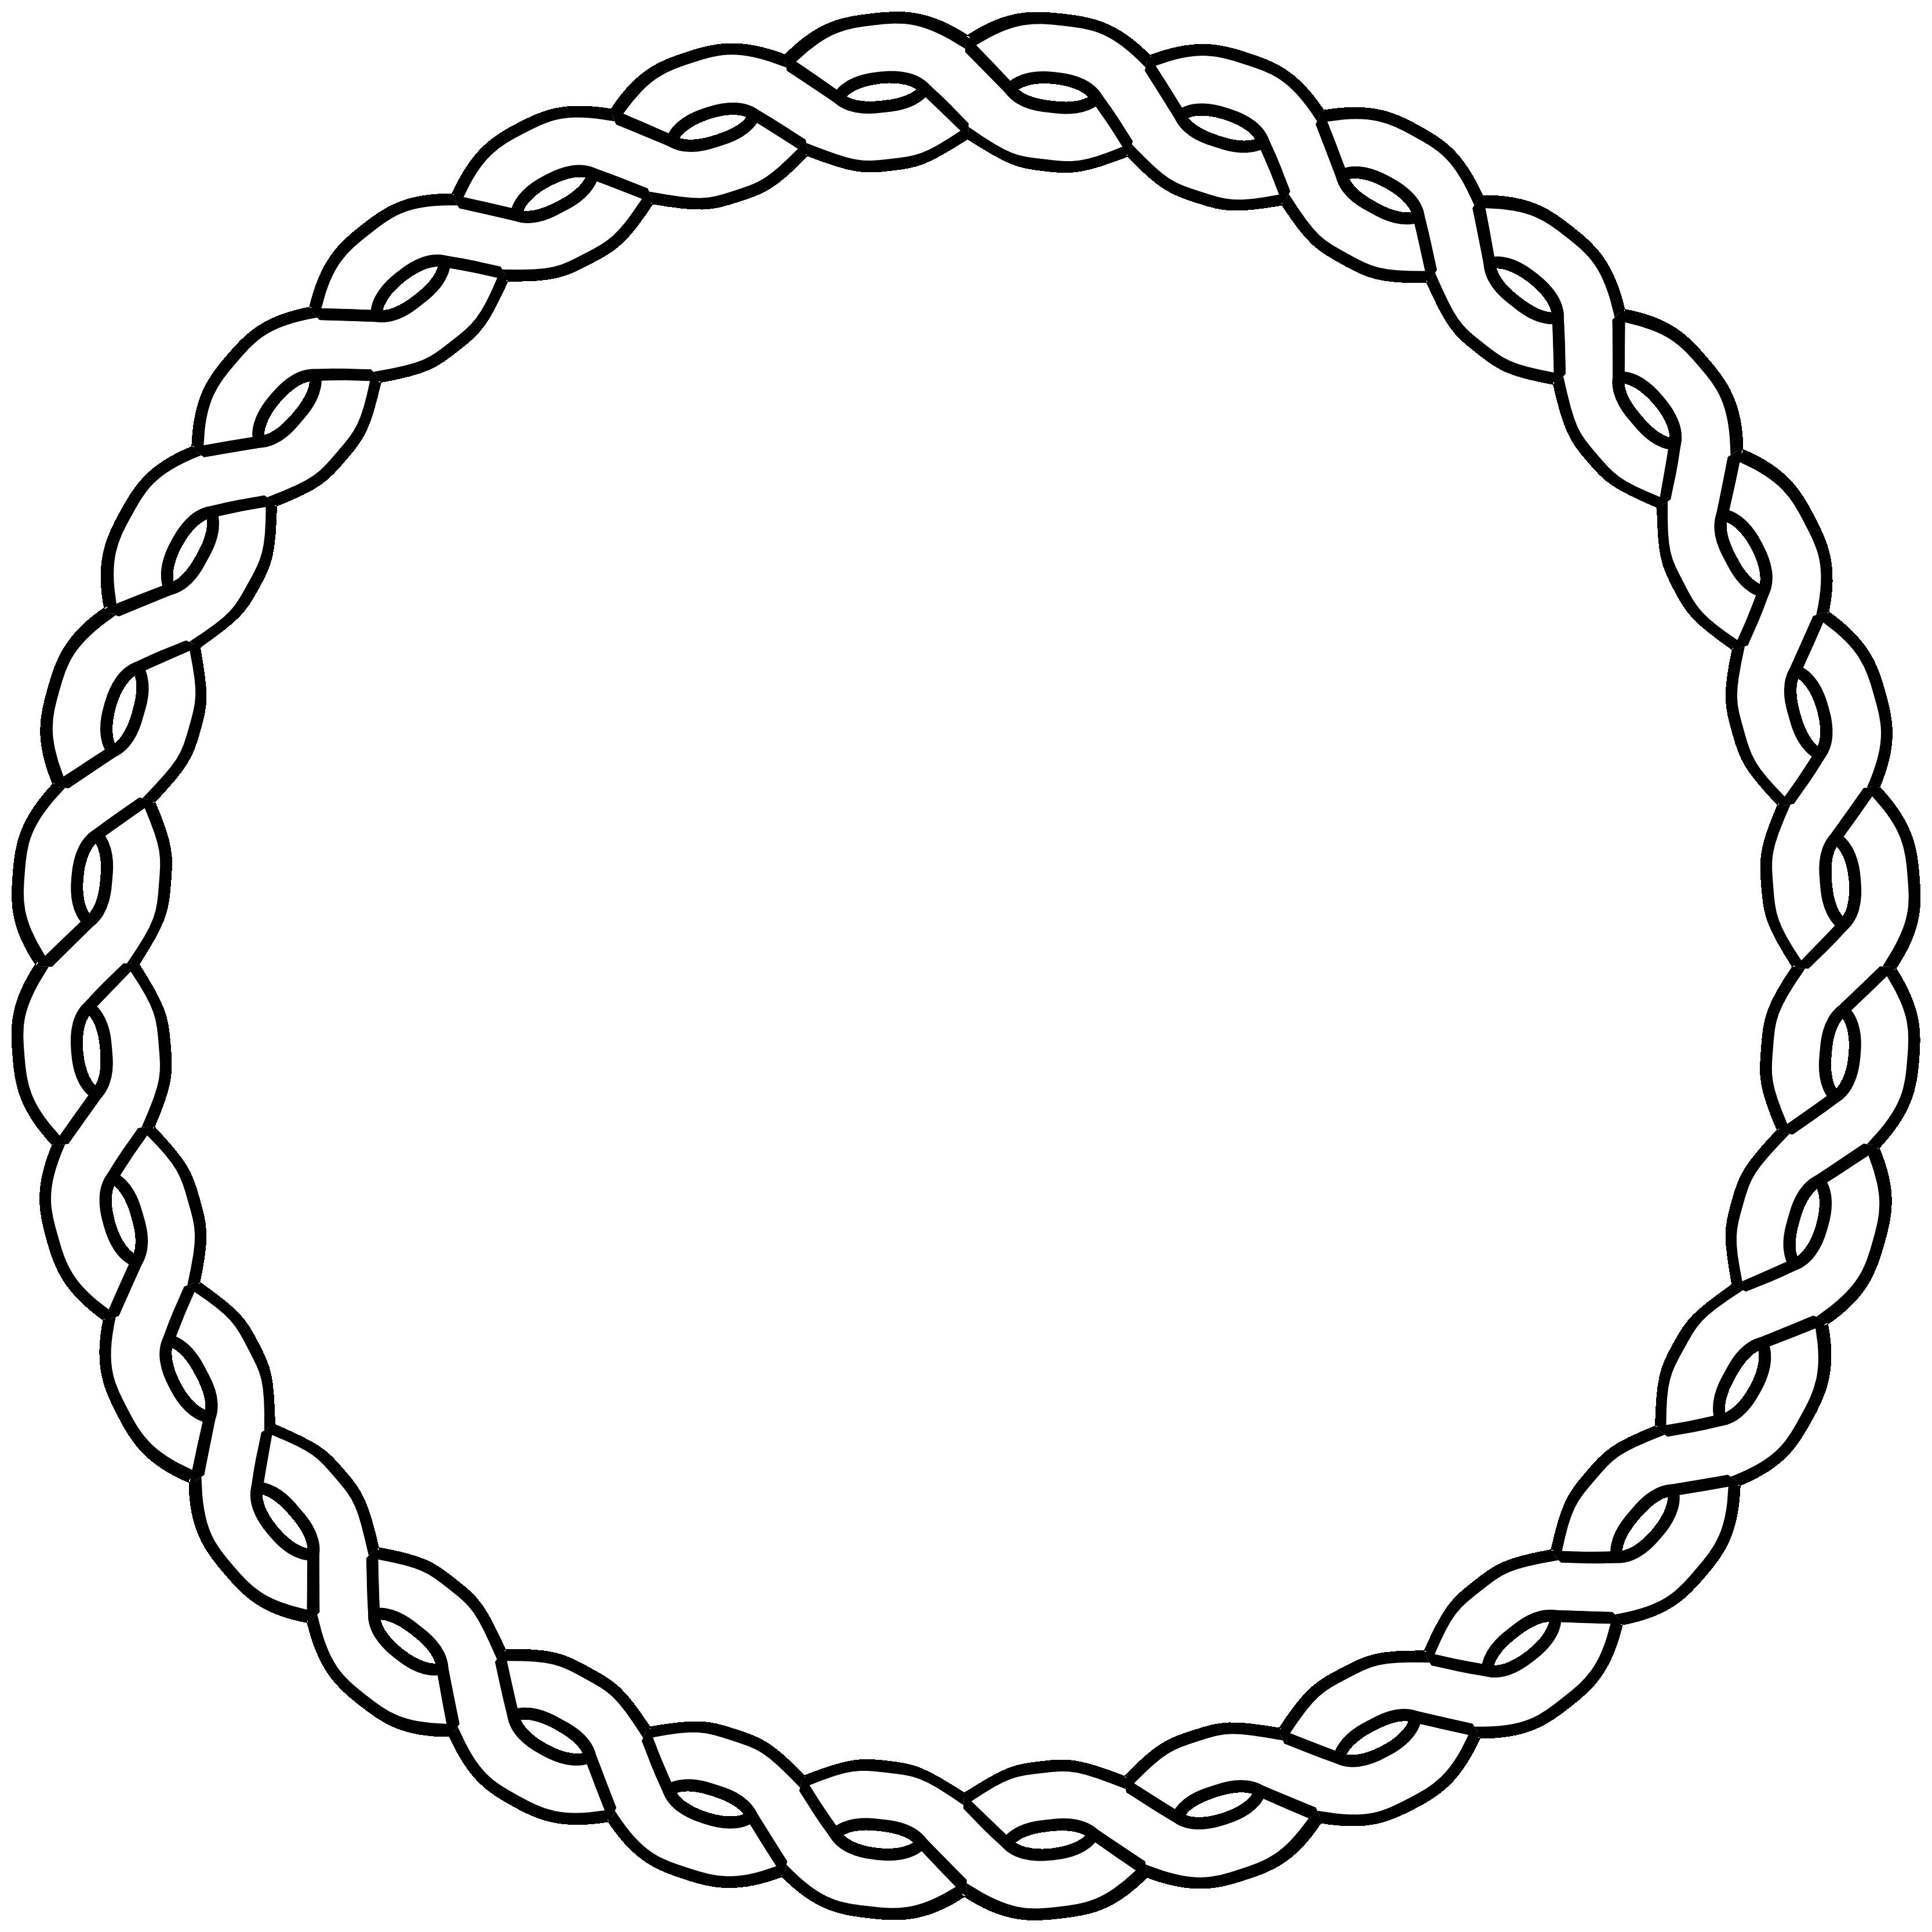 rope border circle black white line art coloring ...